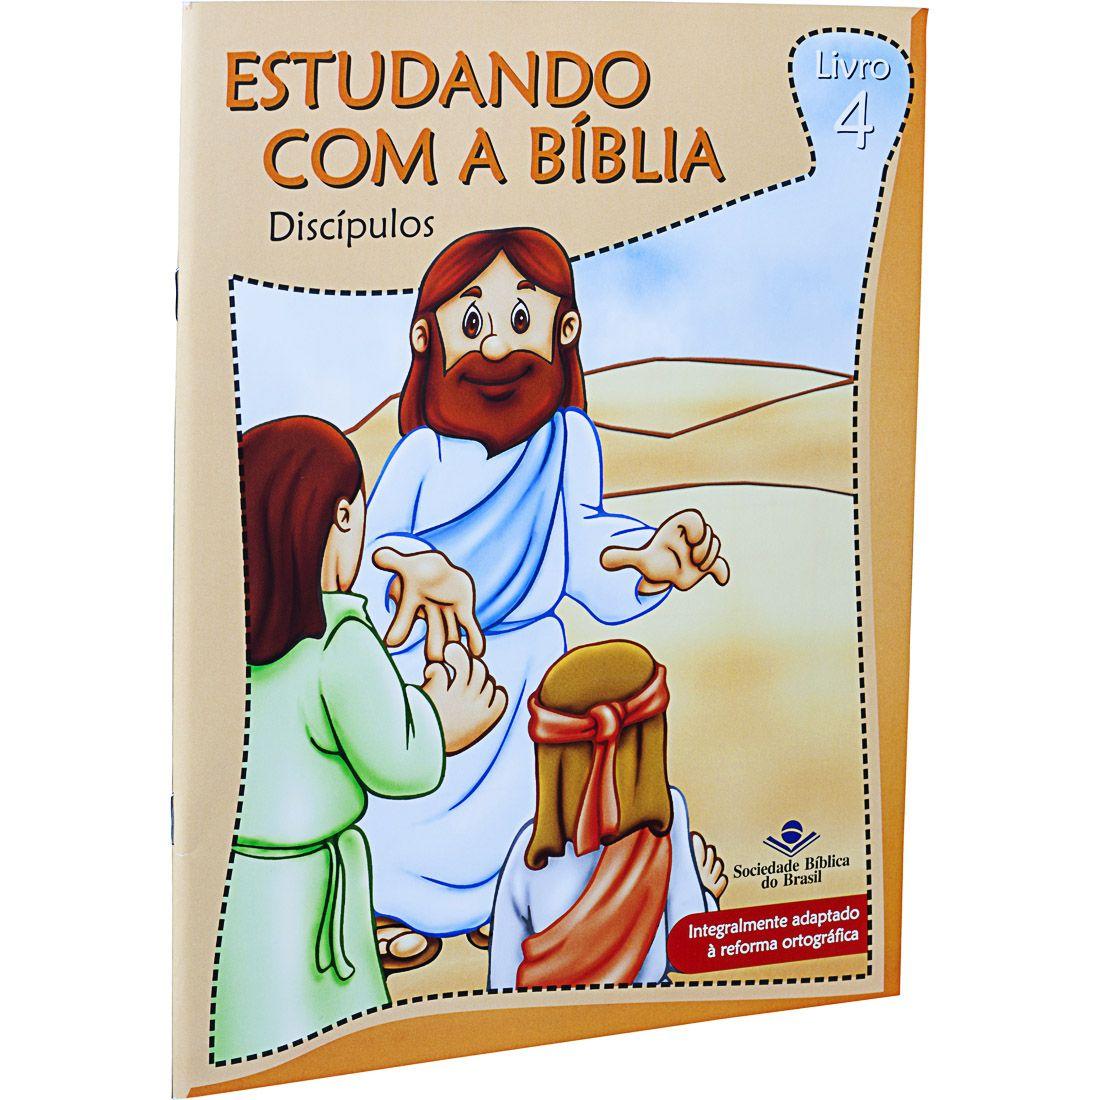 Estudando com a Bíblia - Discípulos